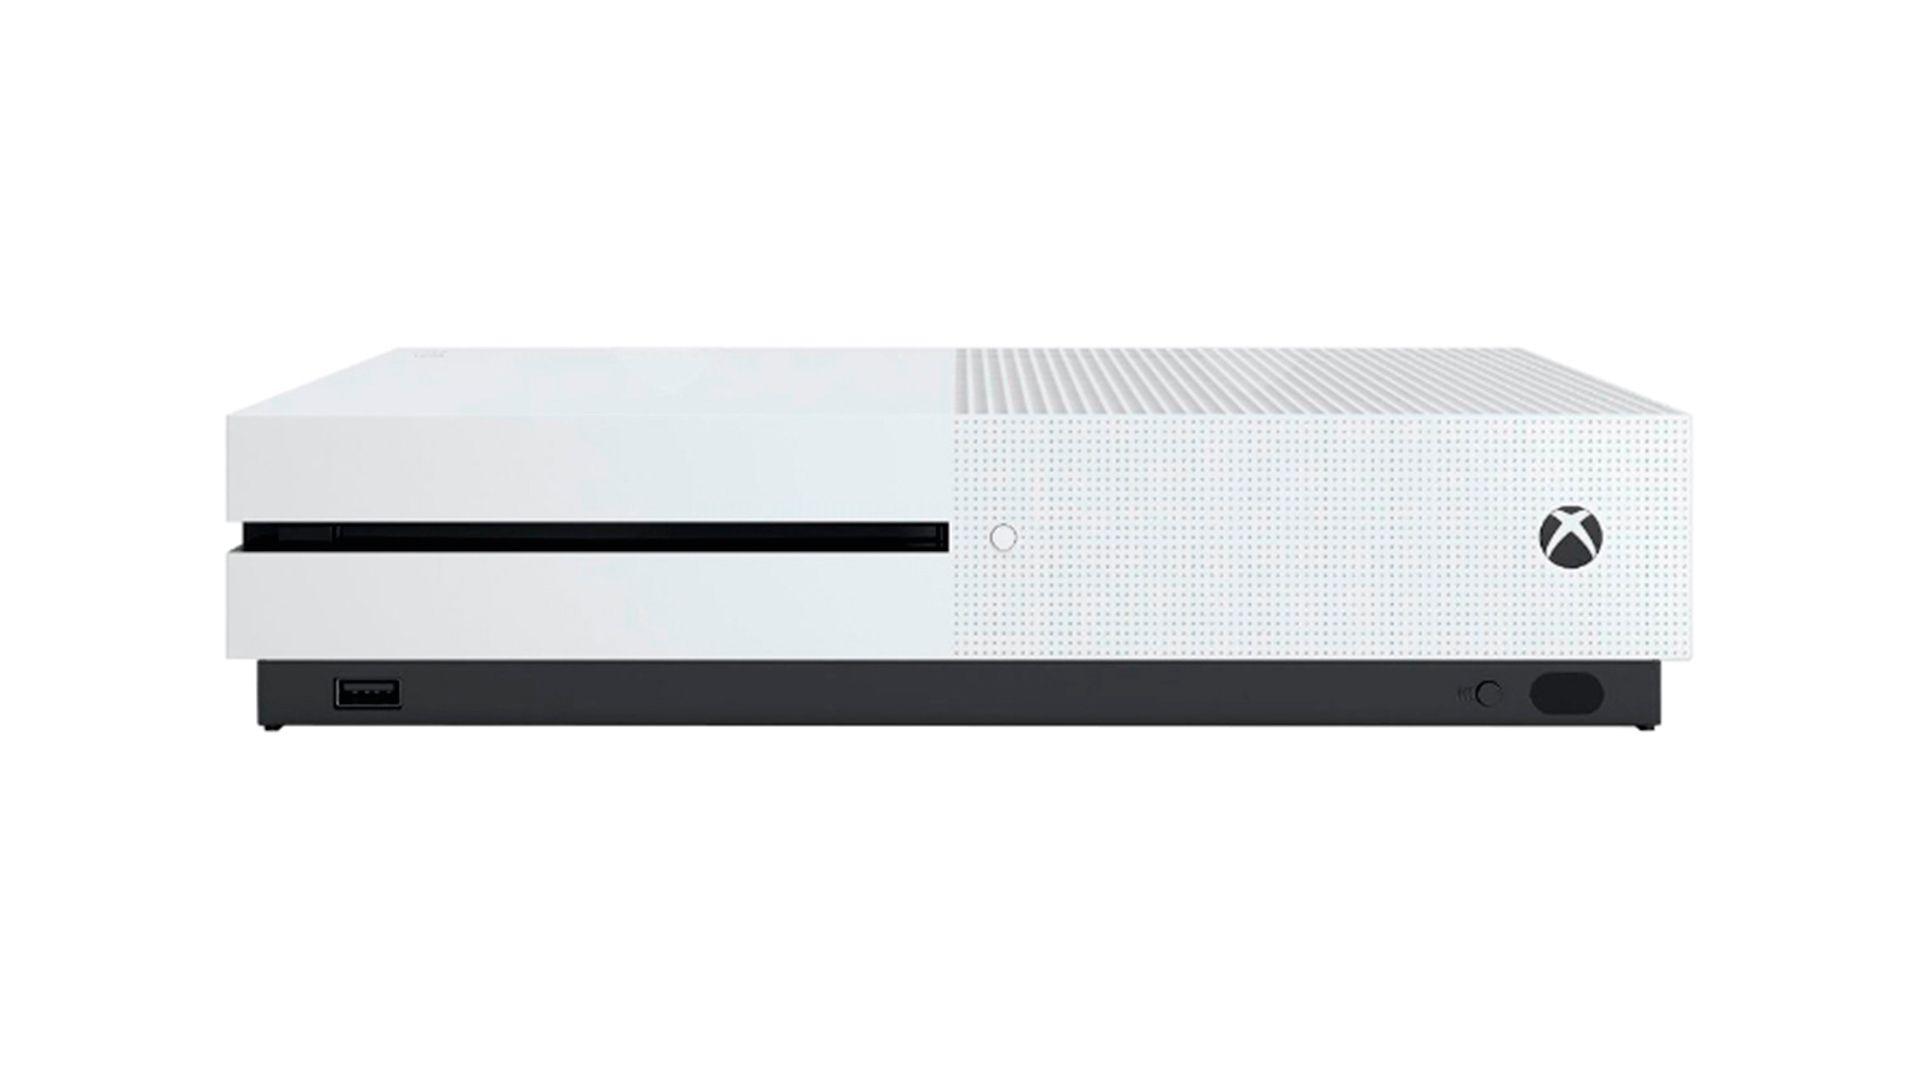 Xbox One S 500Gb FIFA 17 изображение 3